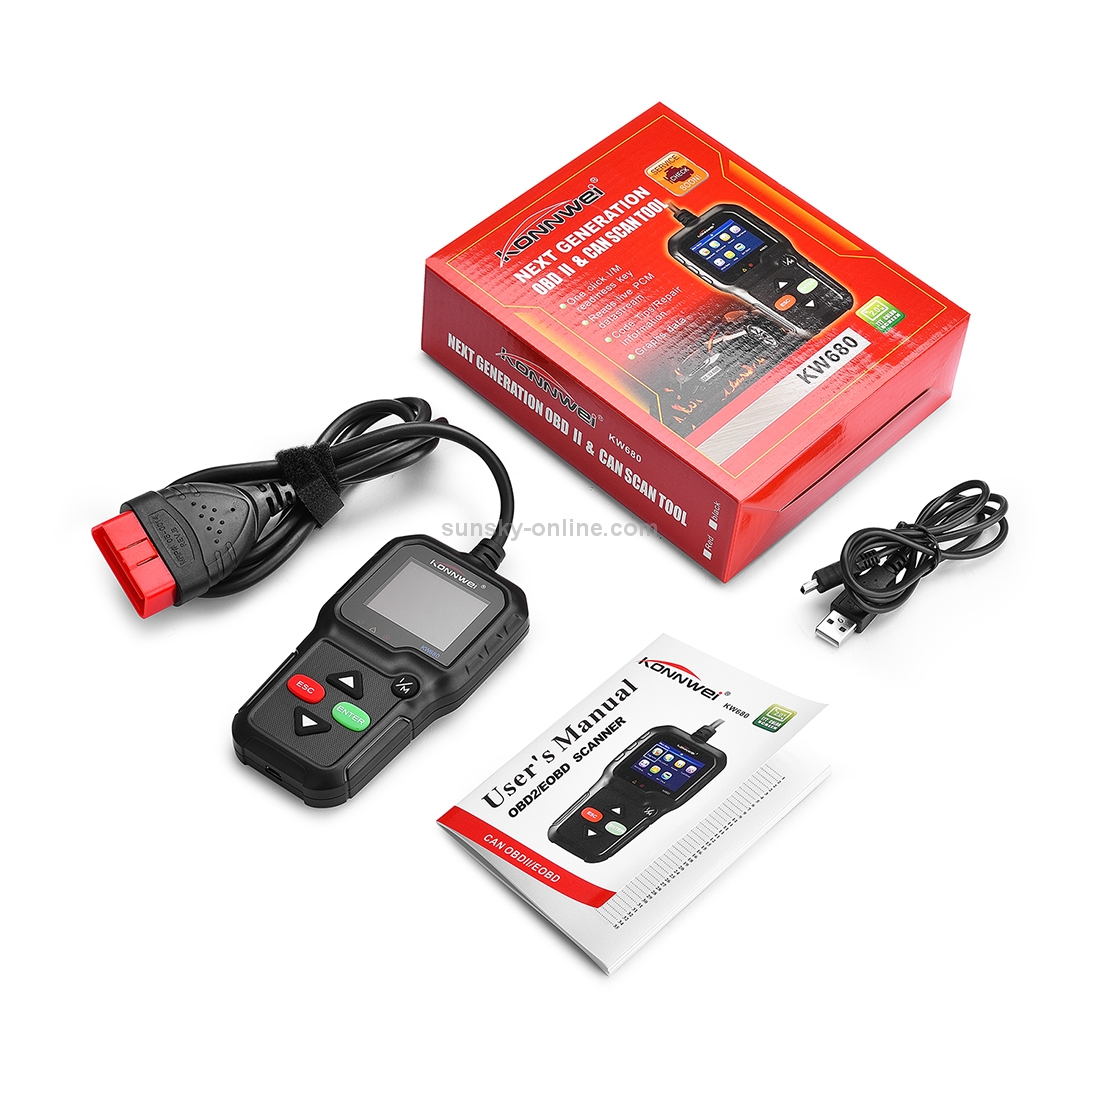 SUNSKY - KW680 Mini OBDII Car Auto Diagnostic Scan Tools Auto Scan